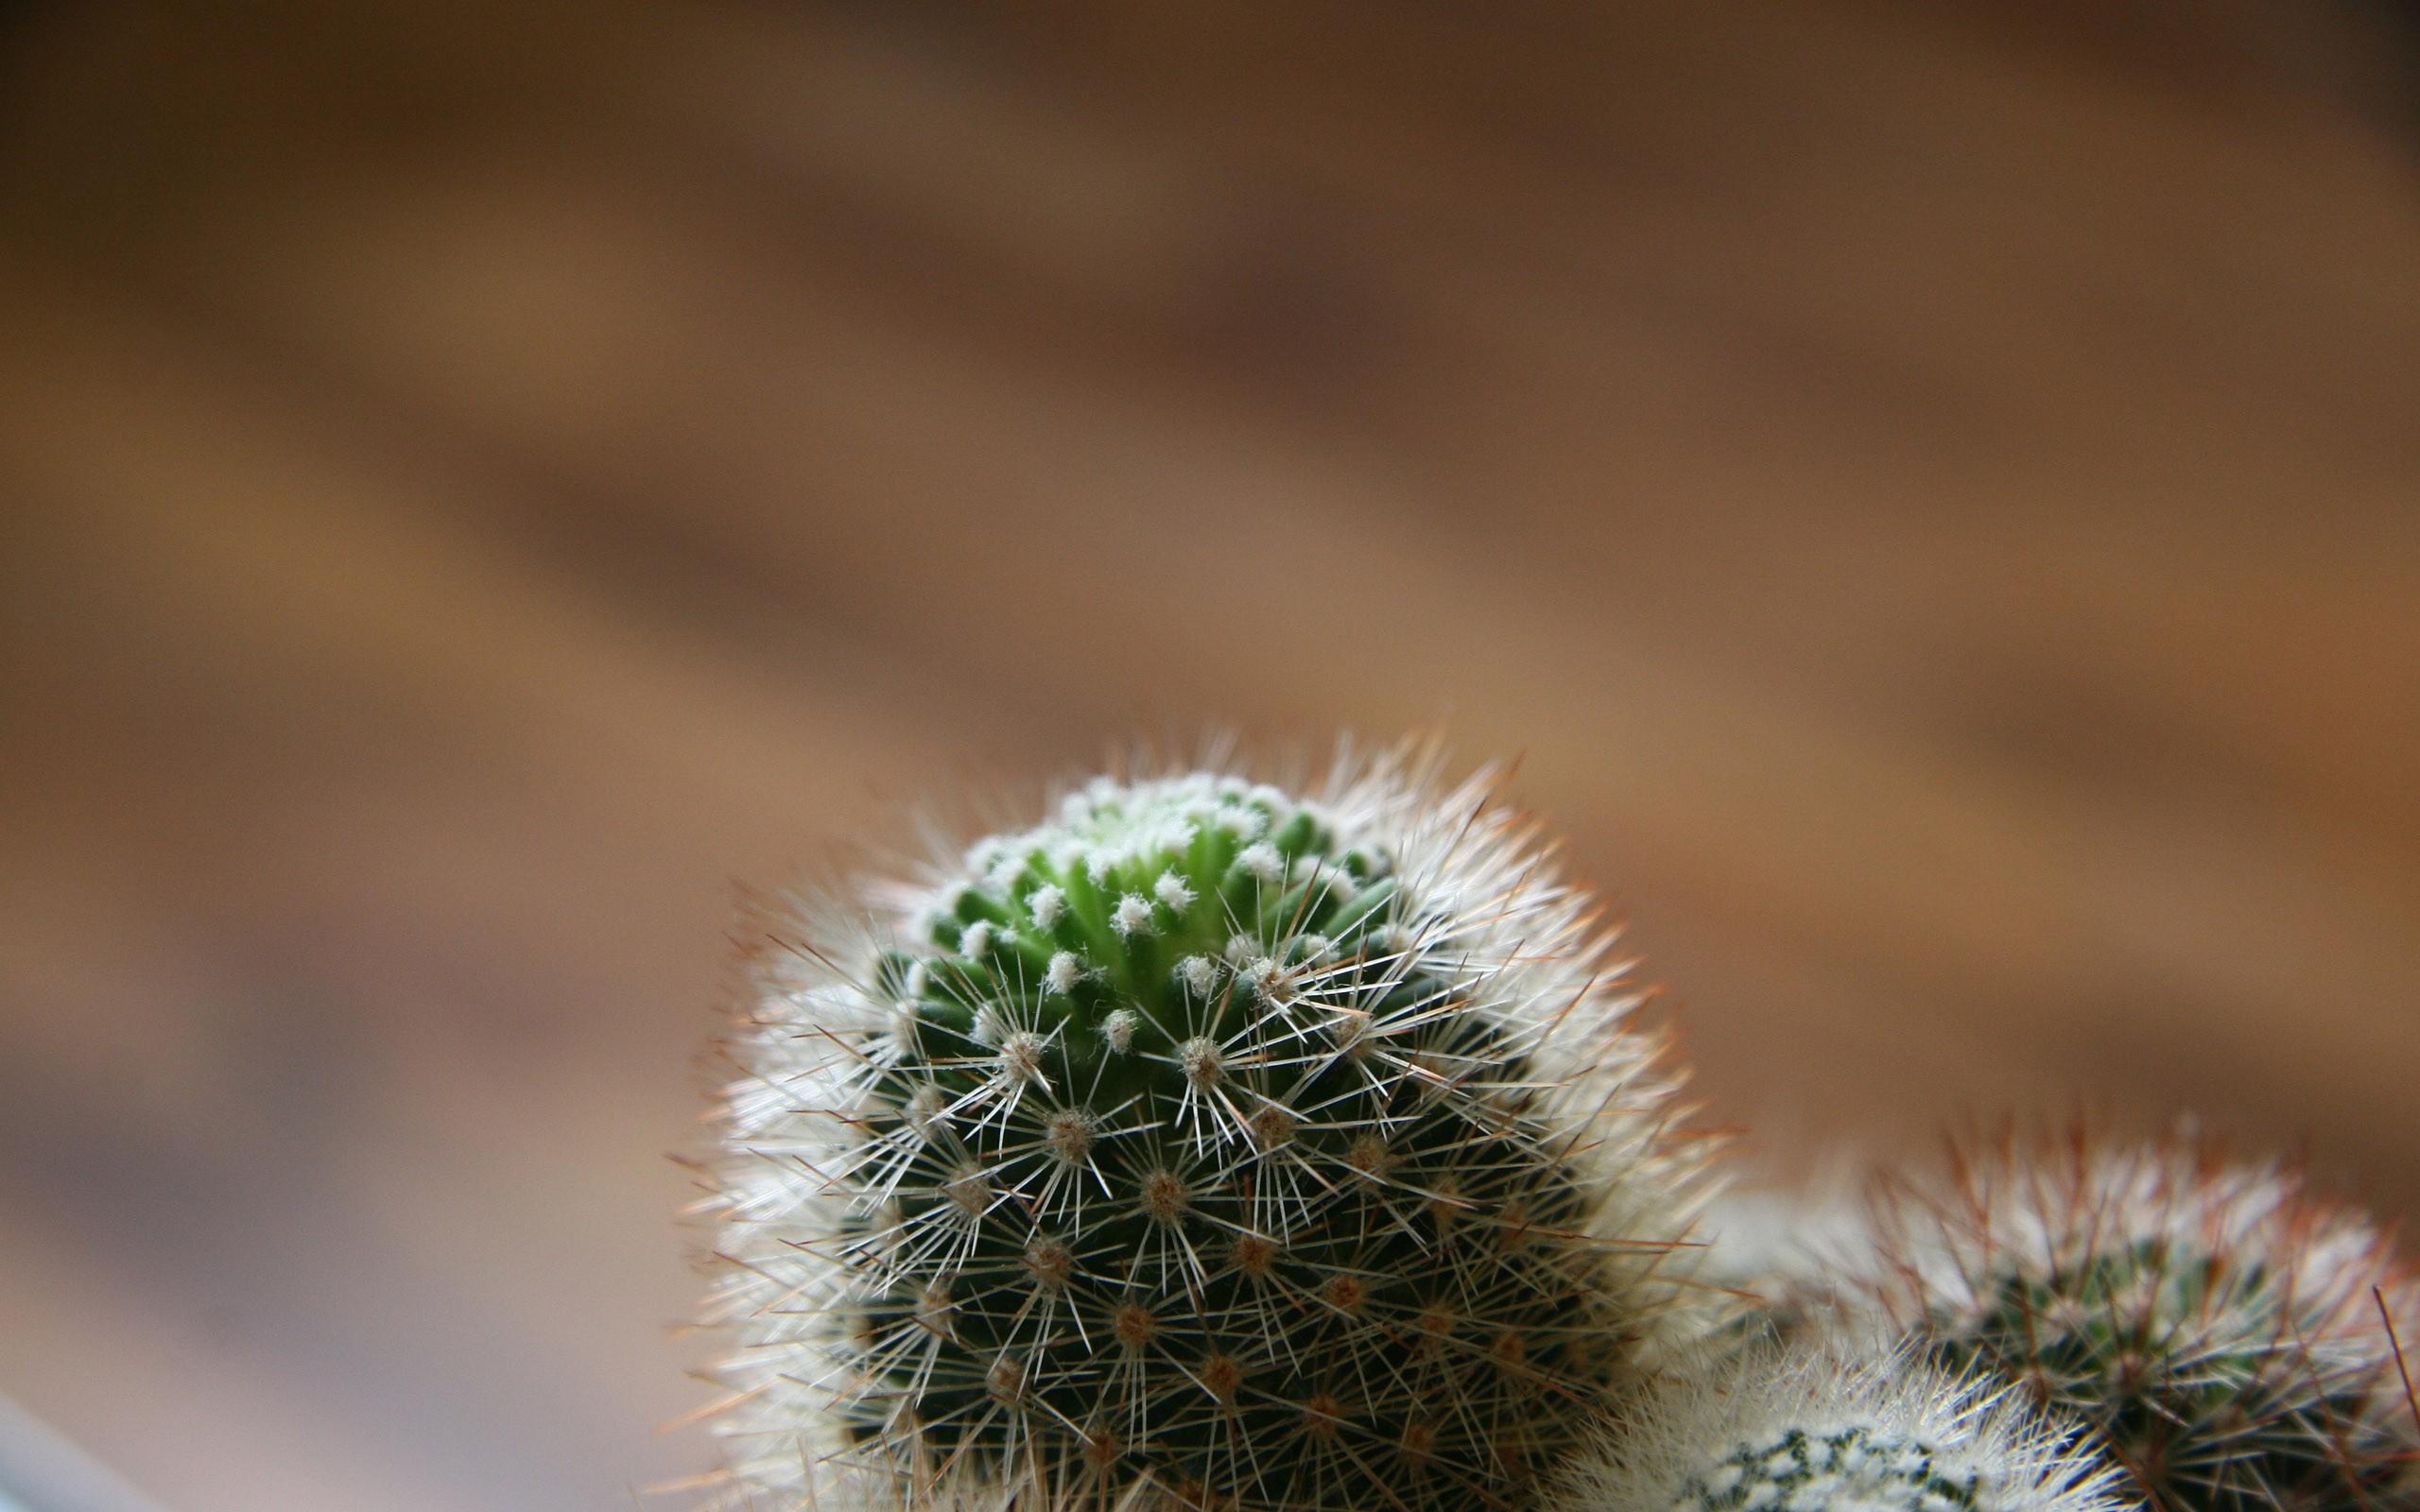 desert wallpaper cactus hd - photo #16